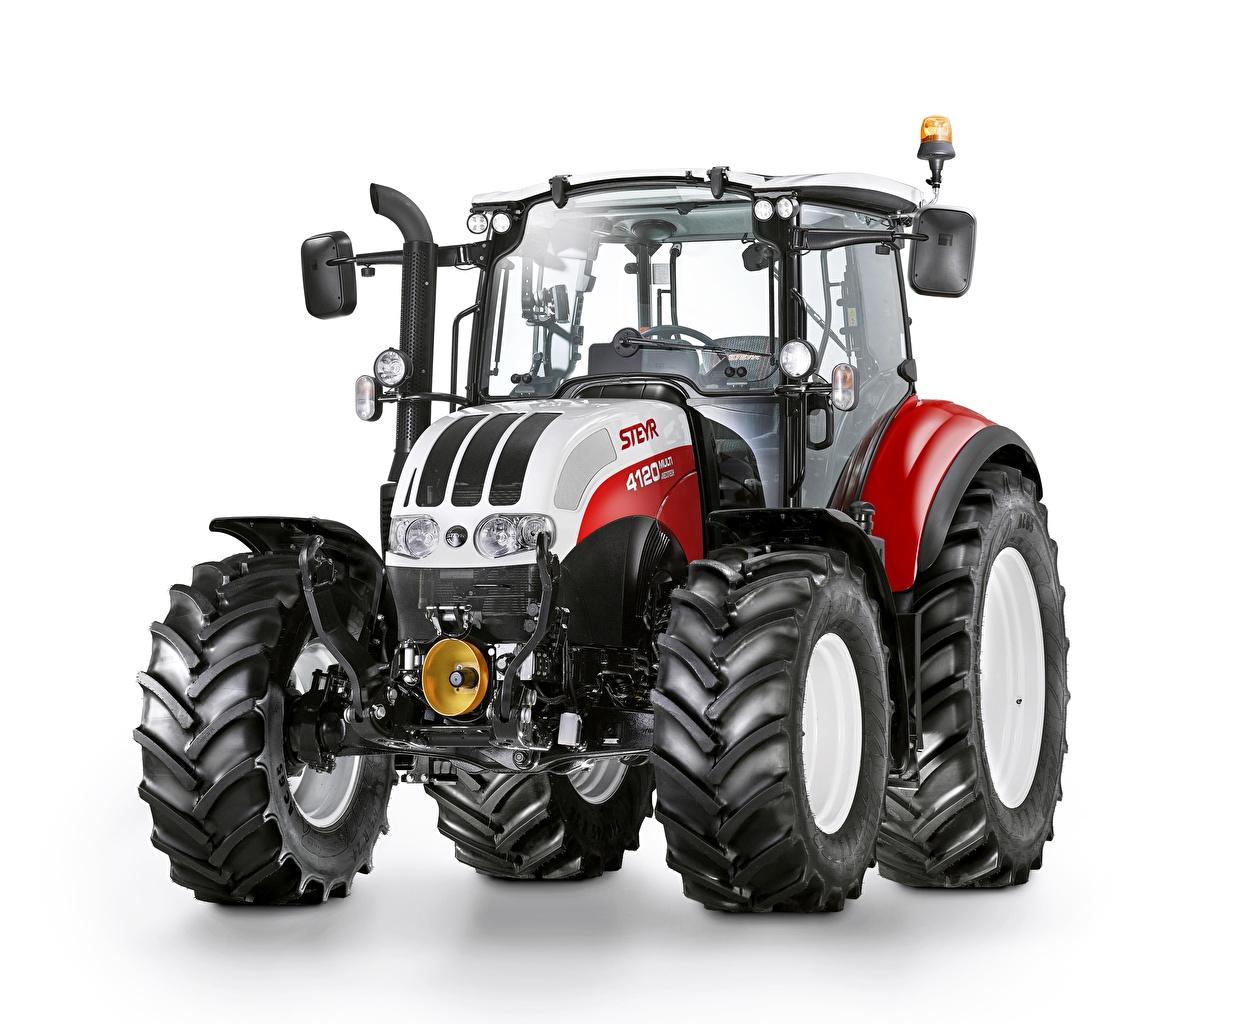 Фотография Трактор Steyr 4120 Multi Спереди белым фоном трактора тракторы Белый фон белом фоне